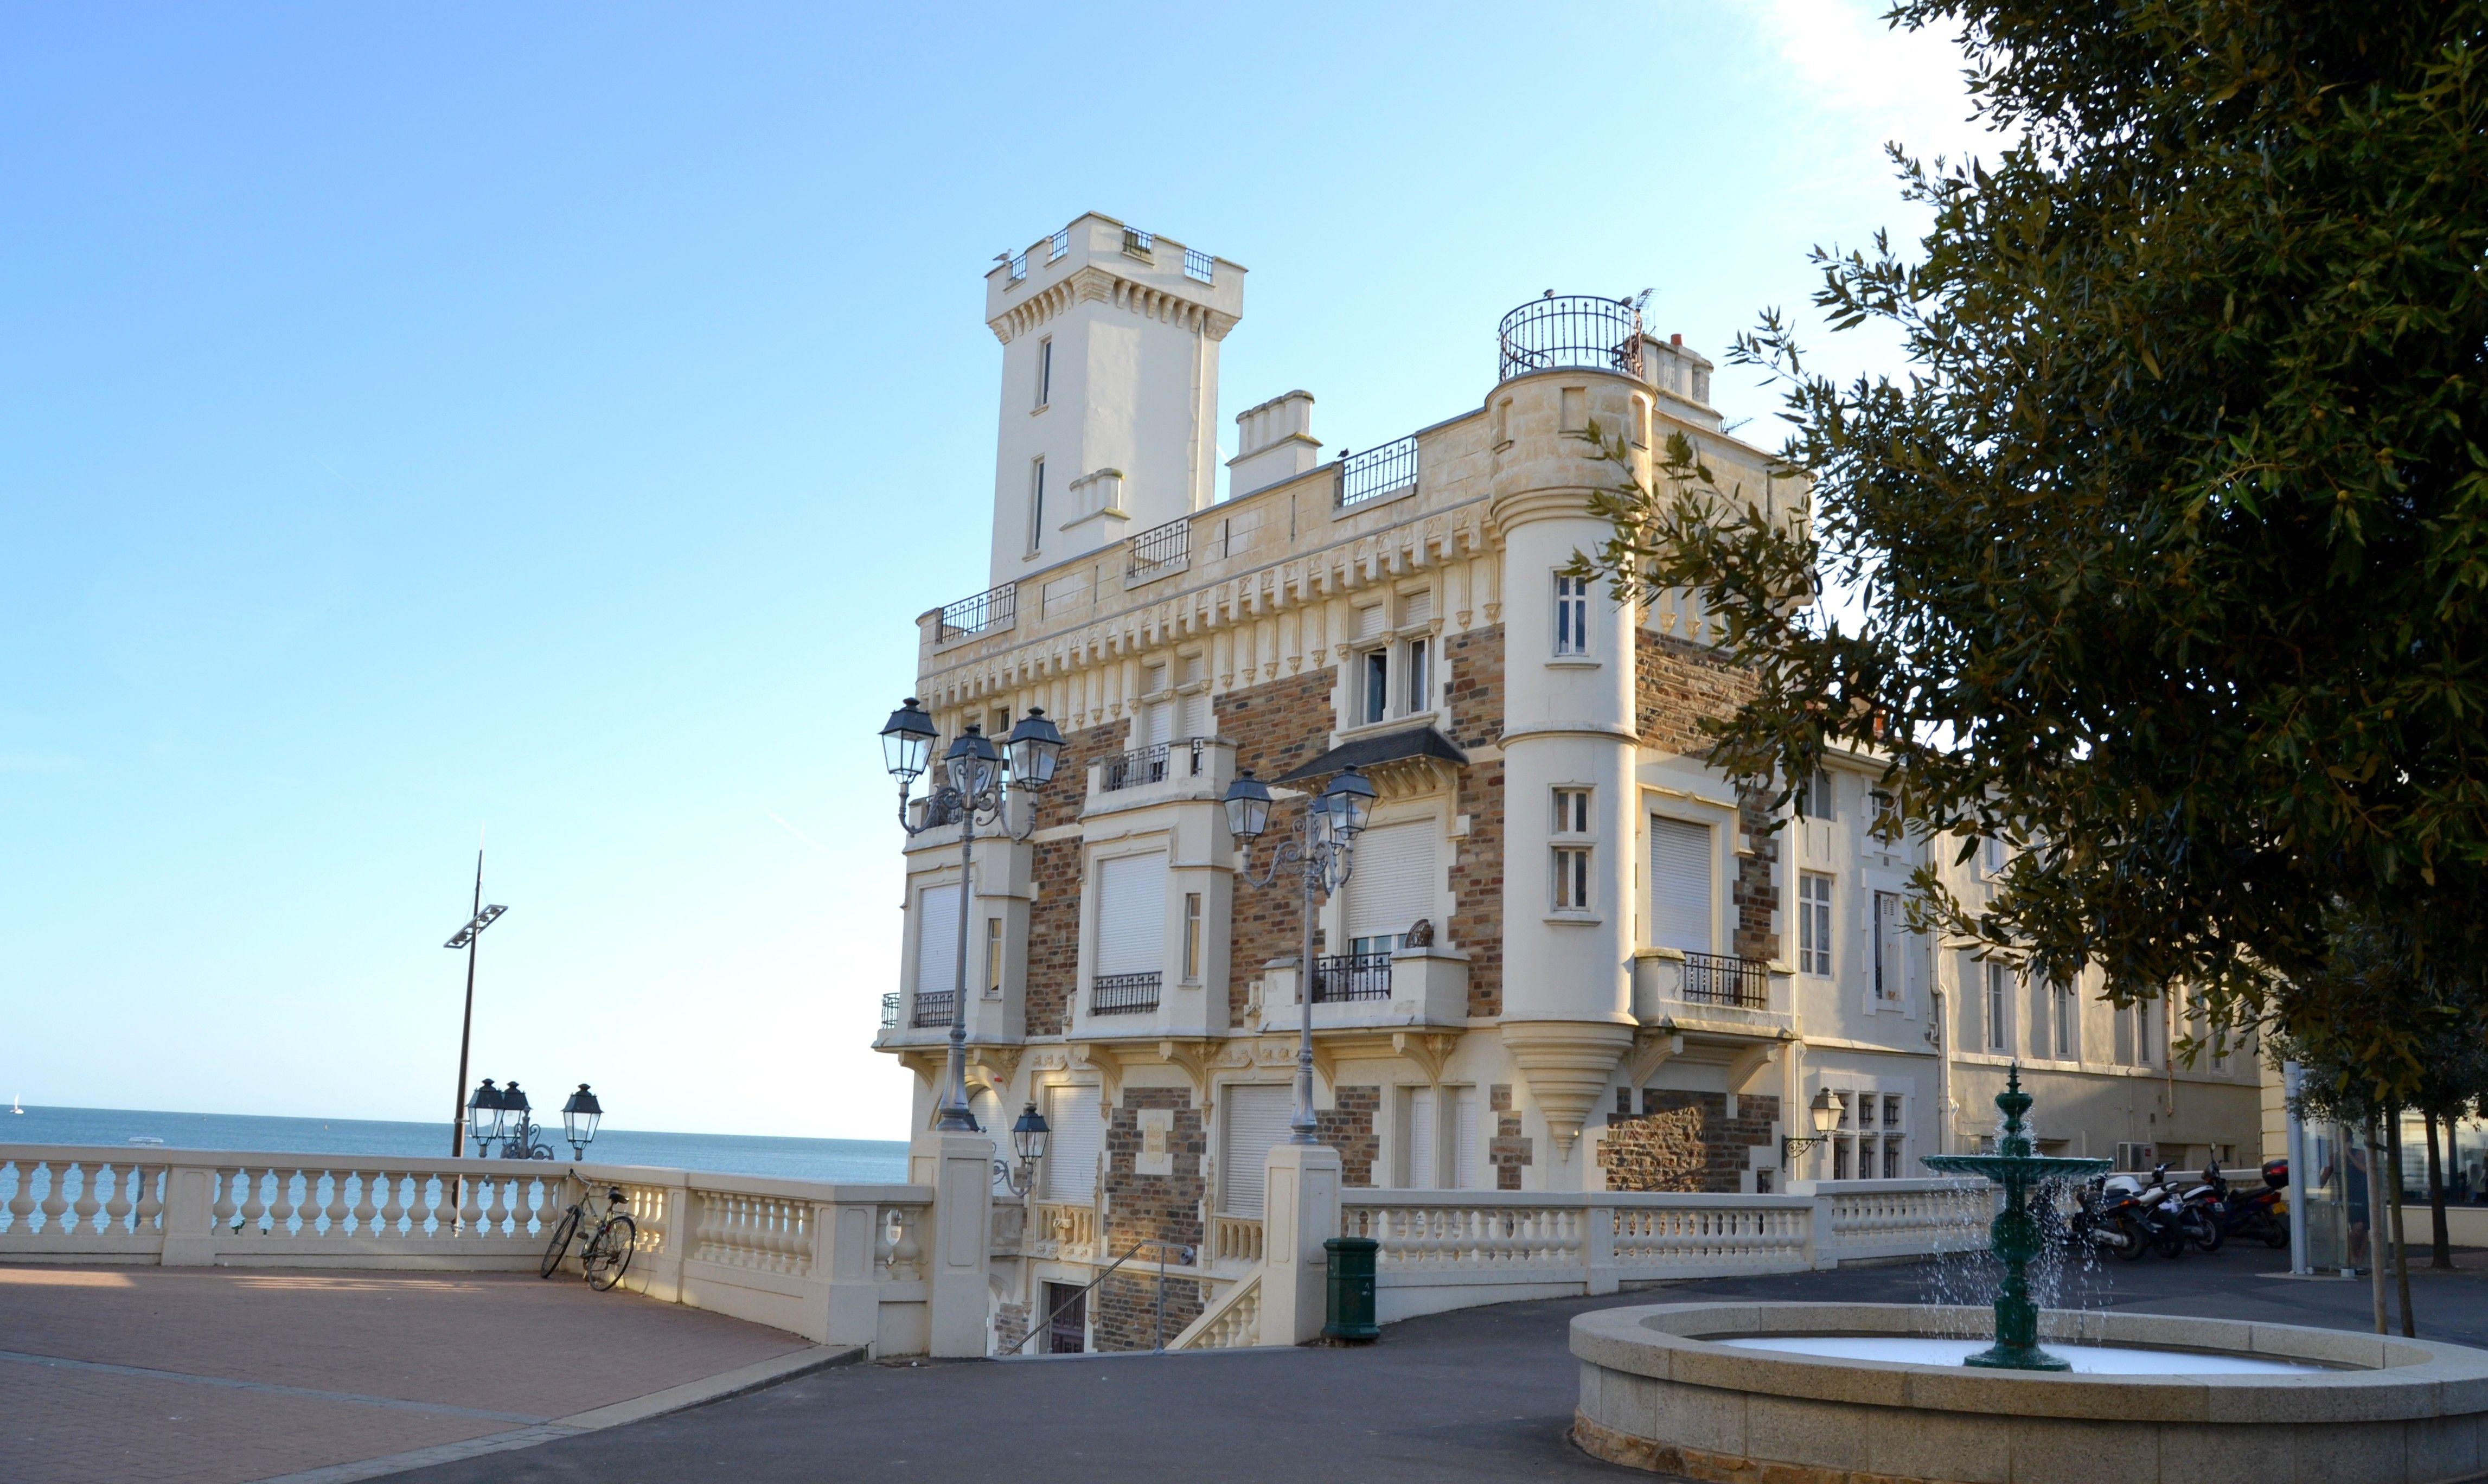 Villa Eugenie Biarritz France Built starting in 1855 by Eugenie